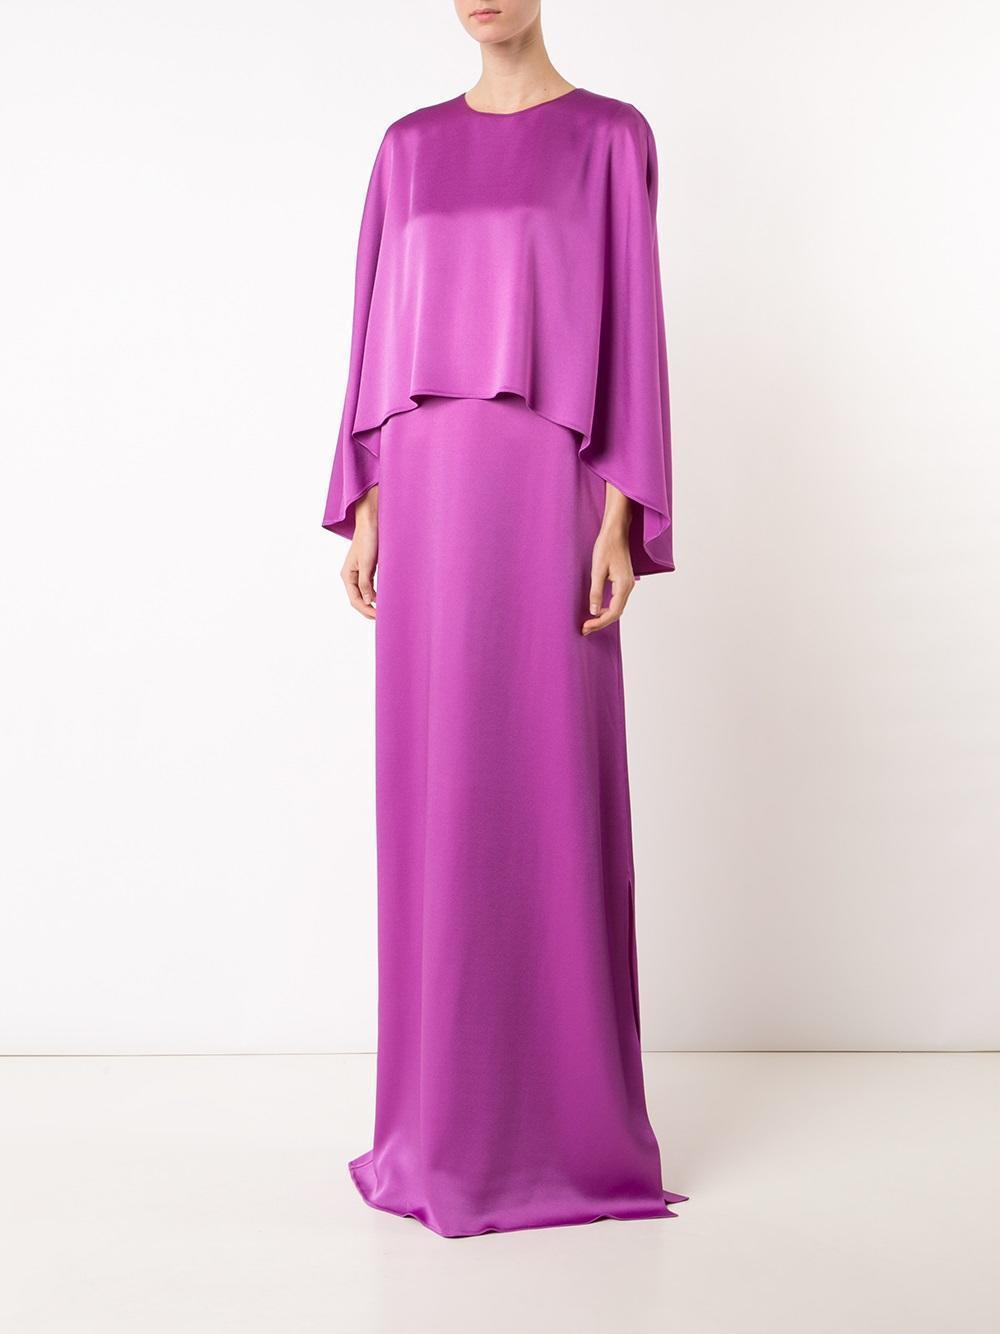 2190 New 17 Resort Oscar de la Renta Hyacinth Purple Caftan Kaftan Gown Dress L